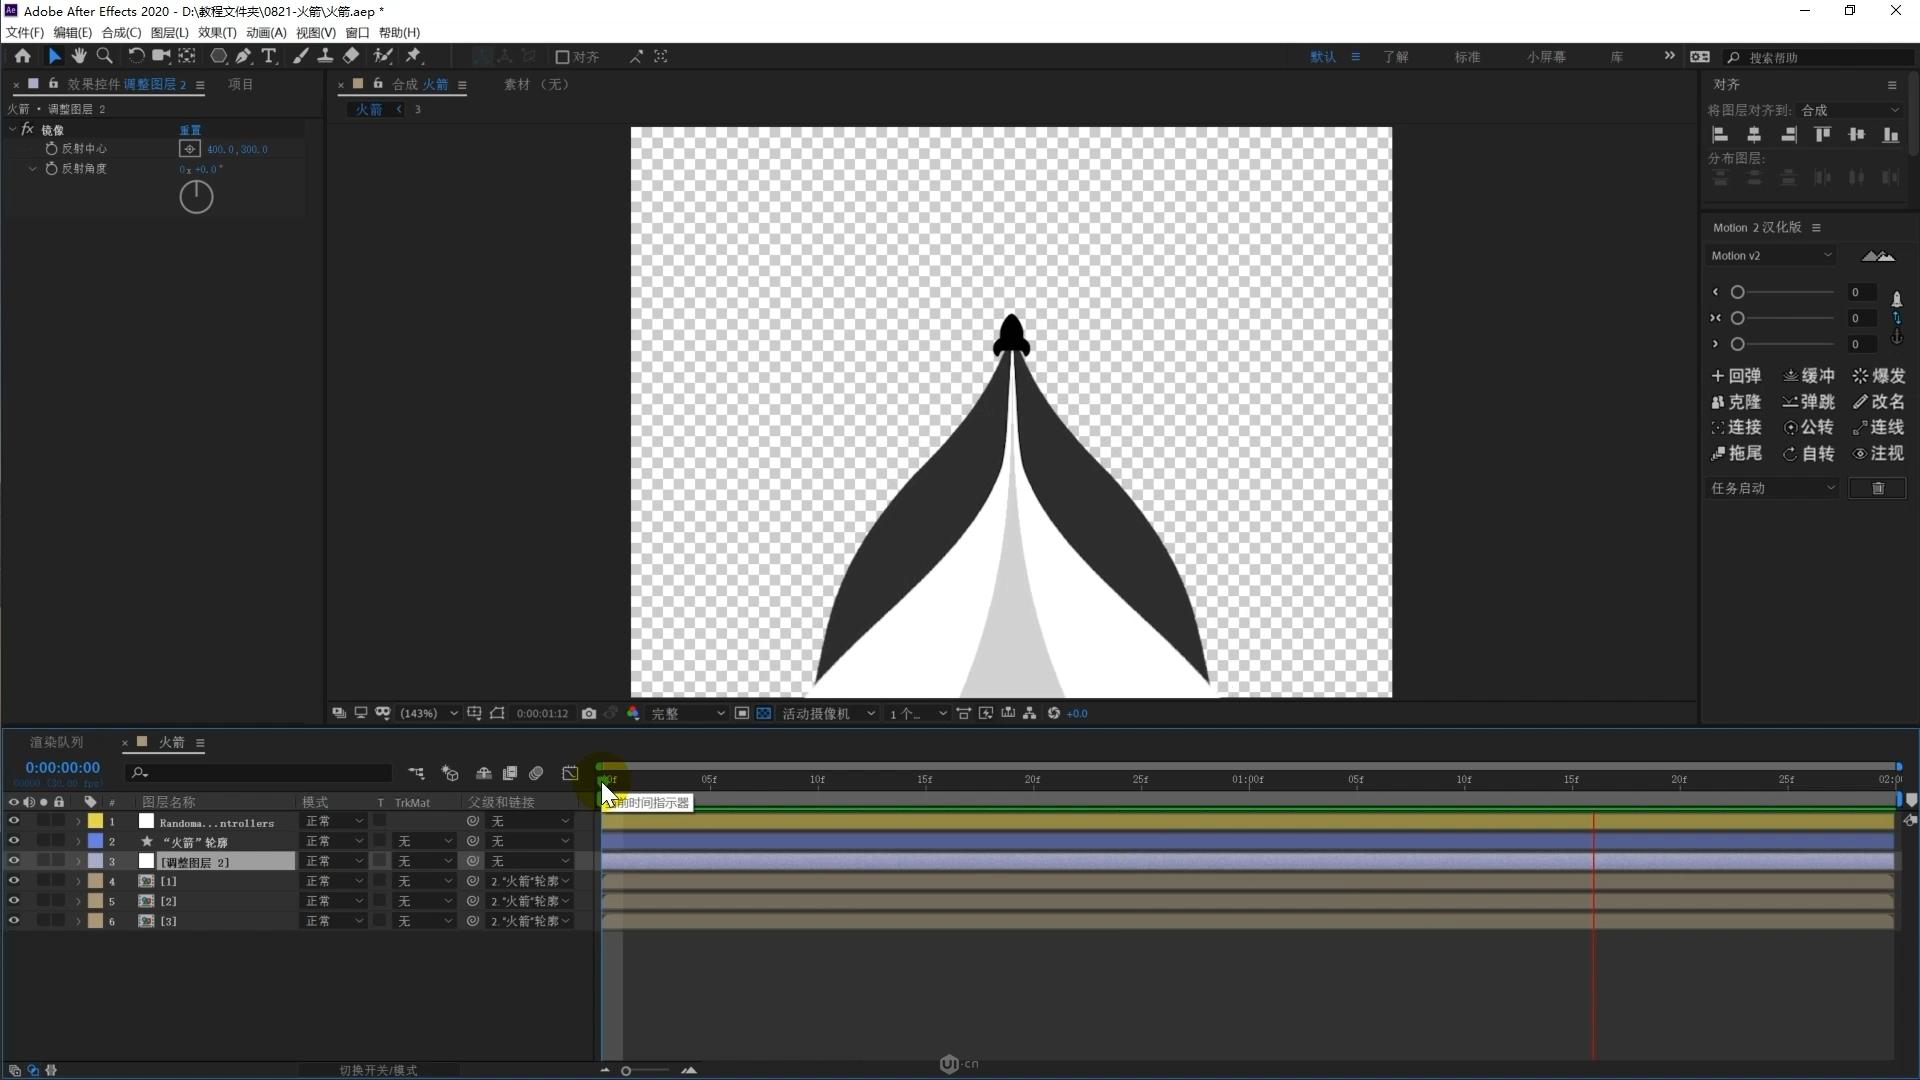 AE如何制作简单的太空旅行MG动画(10)